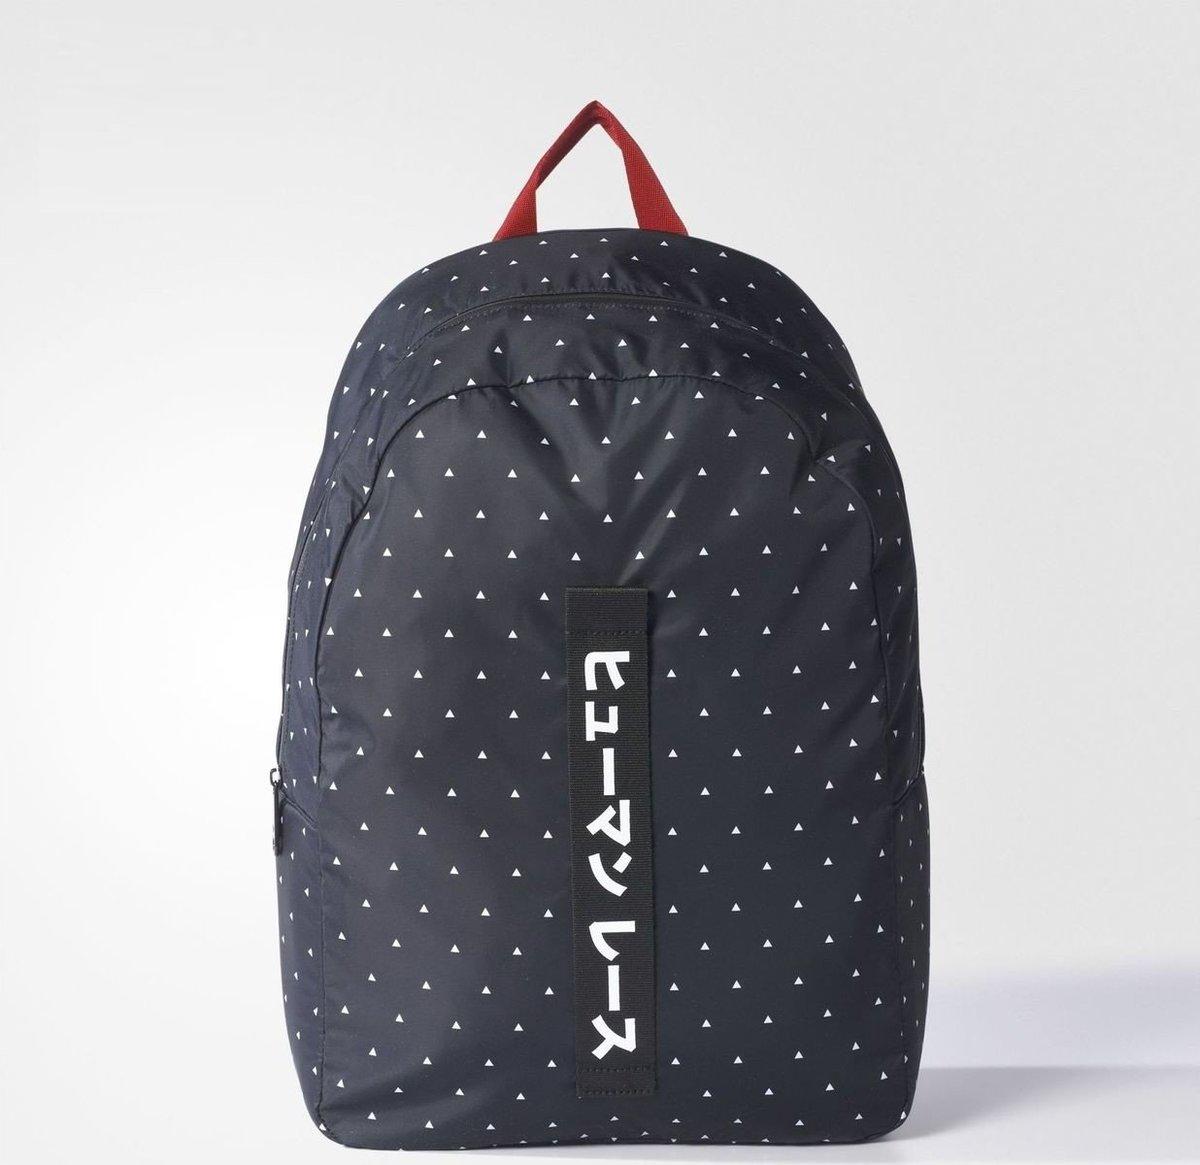 (White Triangles) Japan❤️adidas X PHARRELL WILLIAMS HU ADV Backpack